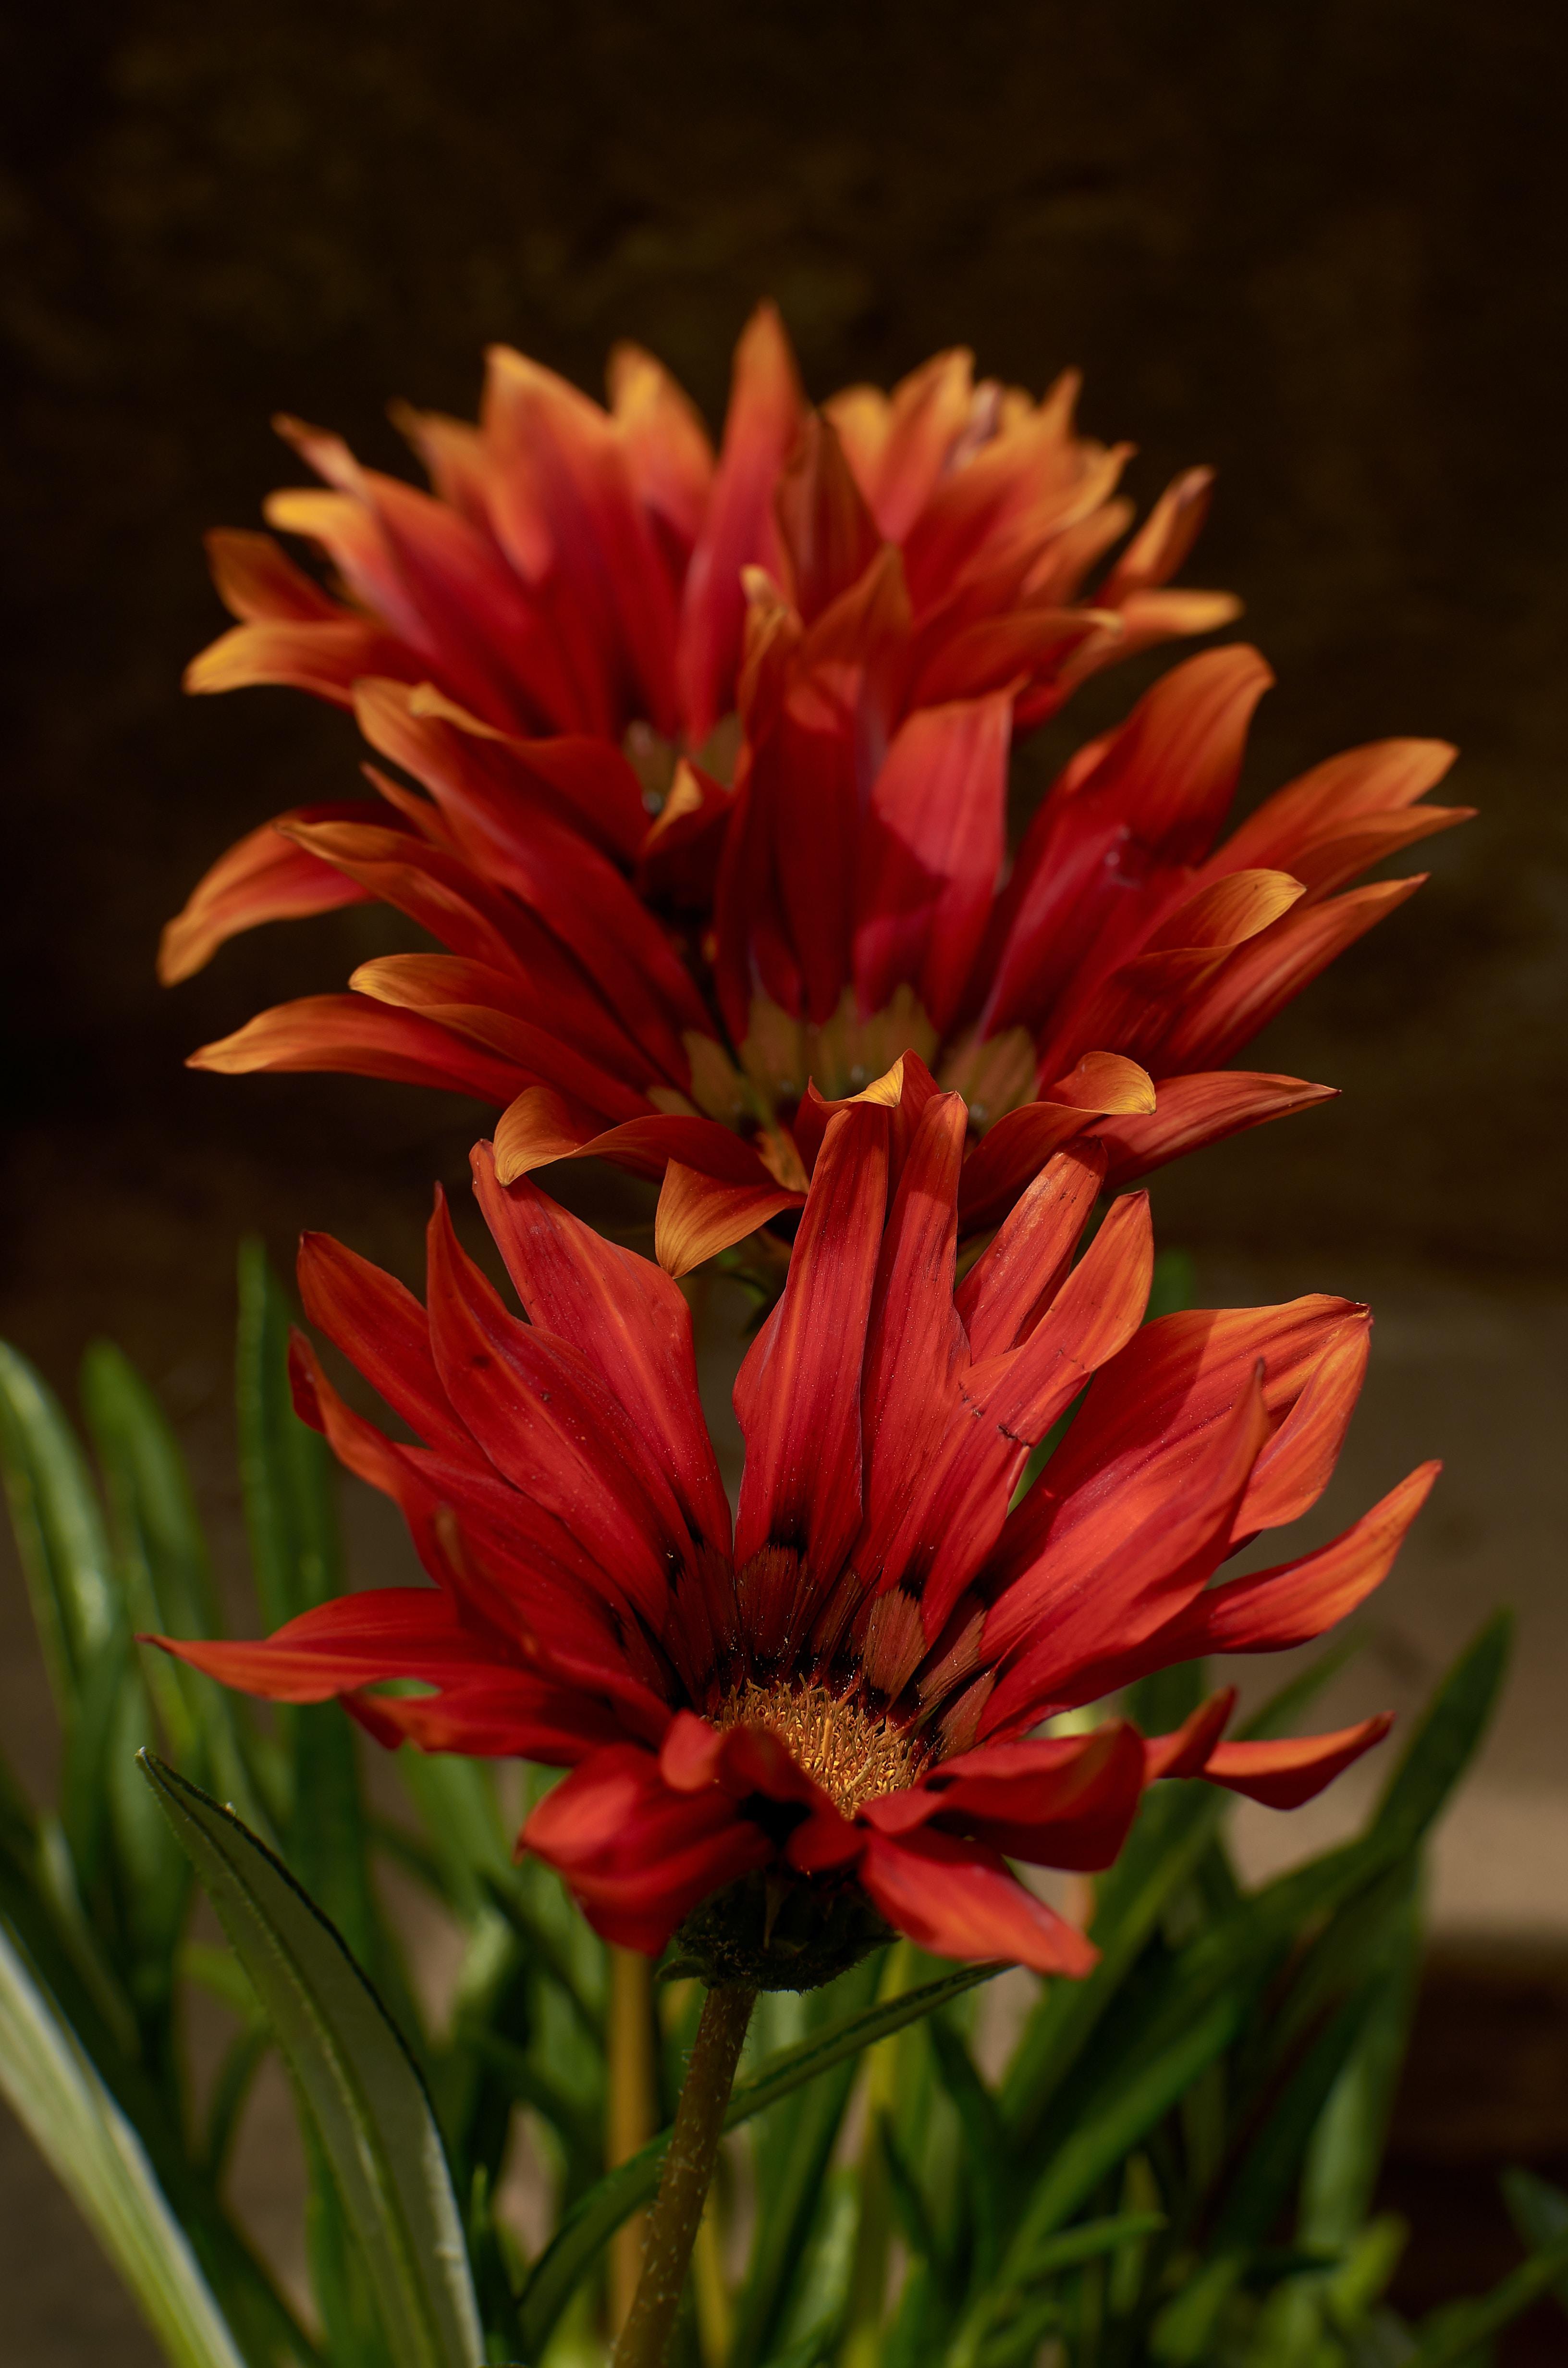 three red flowers close-up photo